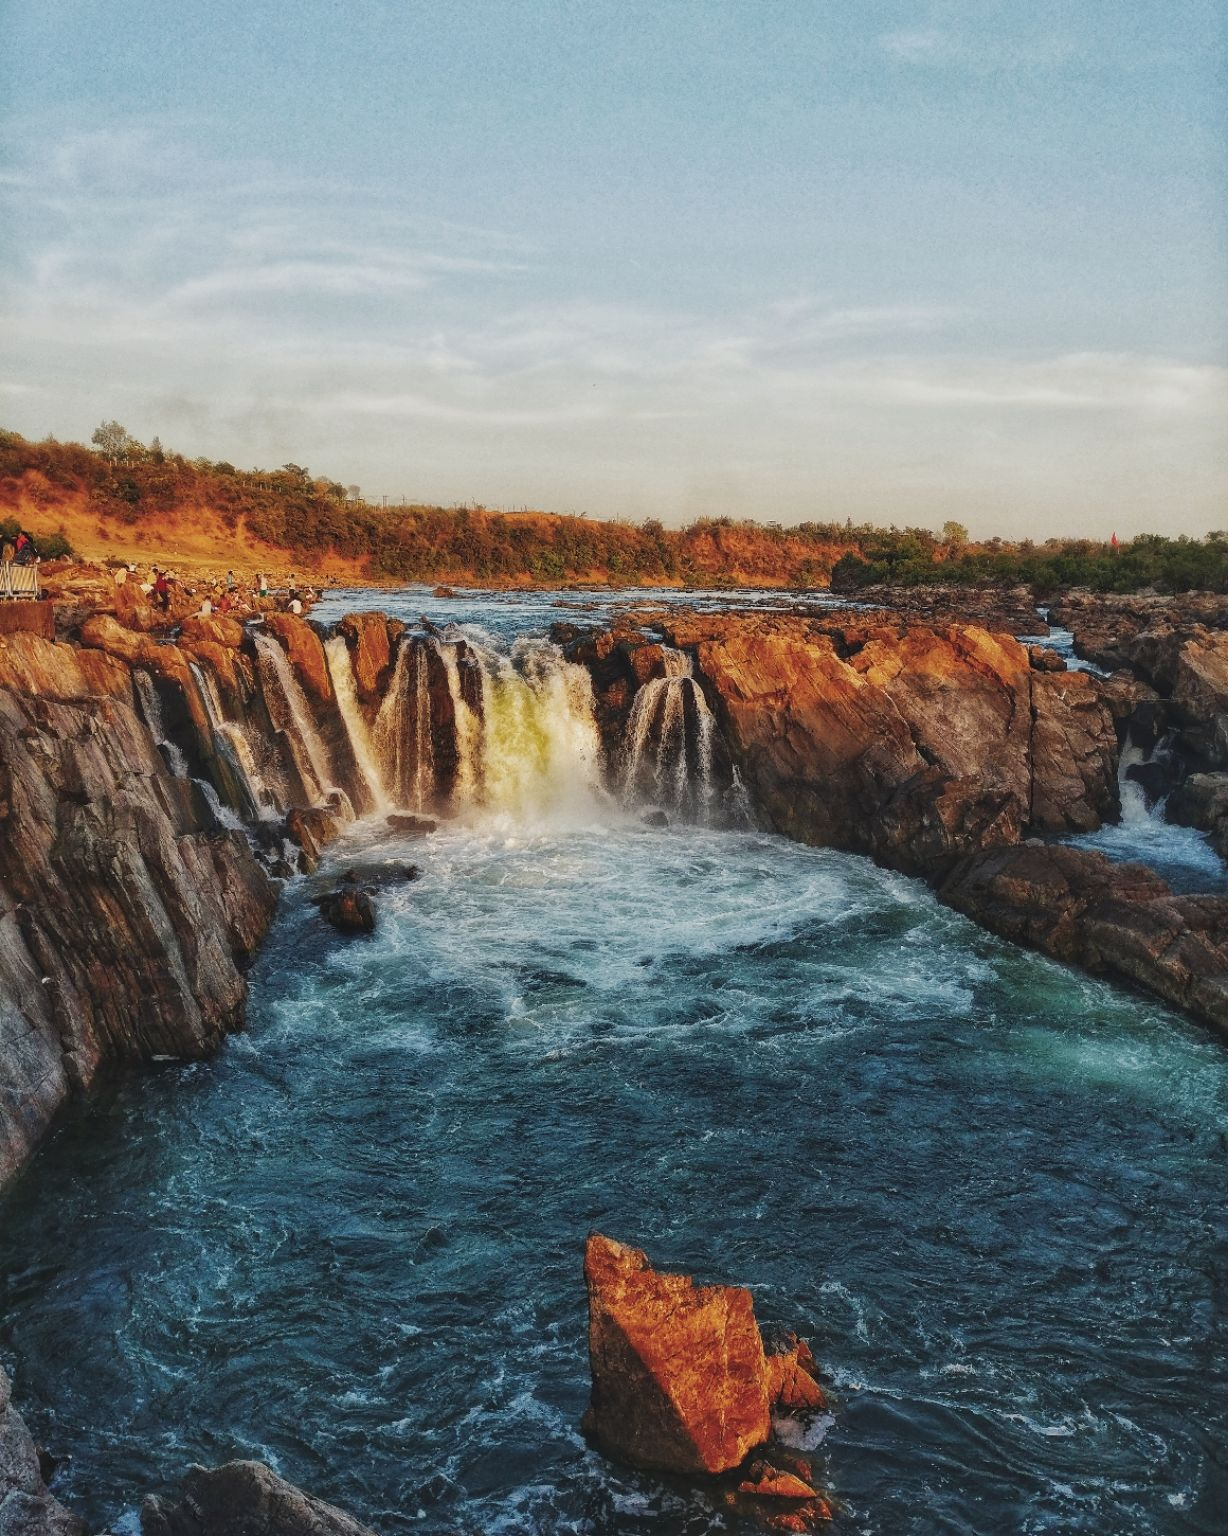 Photo of Dhuandhar Falls By Ashutosh Shrivastava